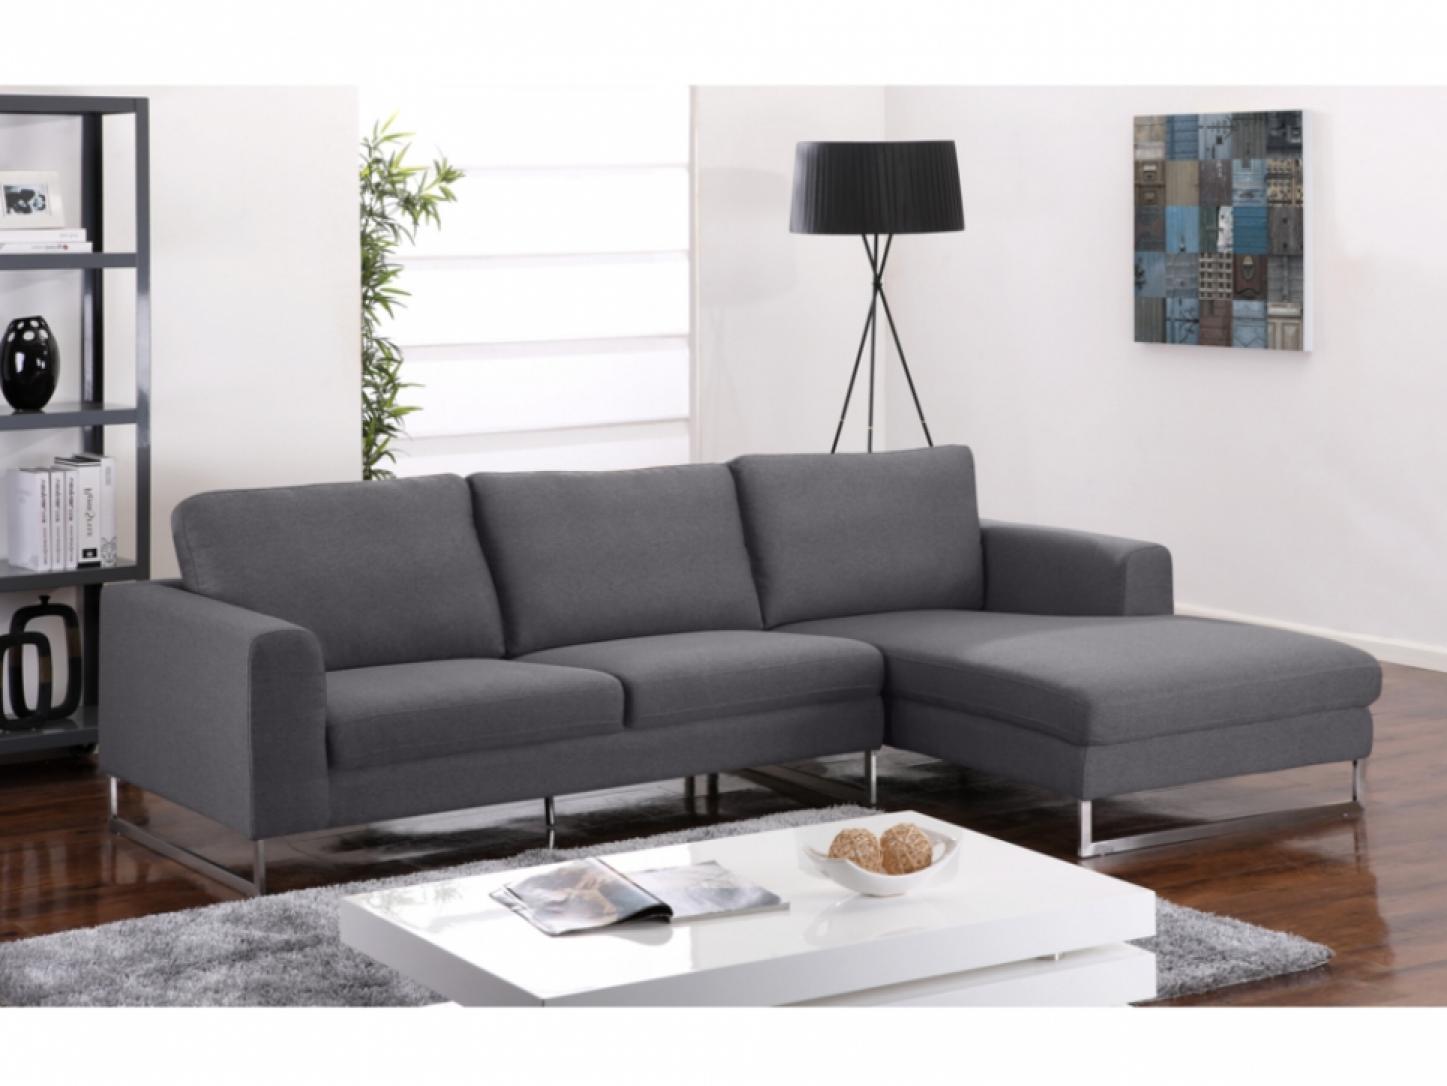 photos canap gris anthracite. Black Bedroom Furniture Sets. Home Design Ideas